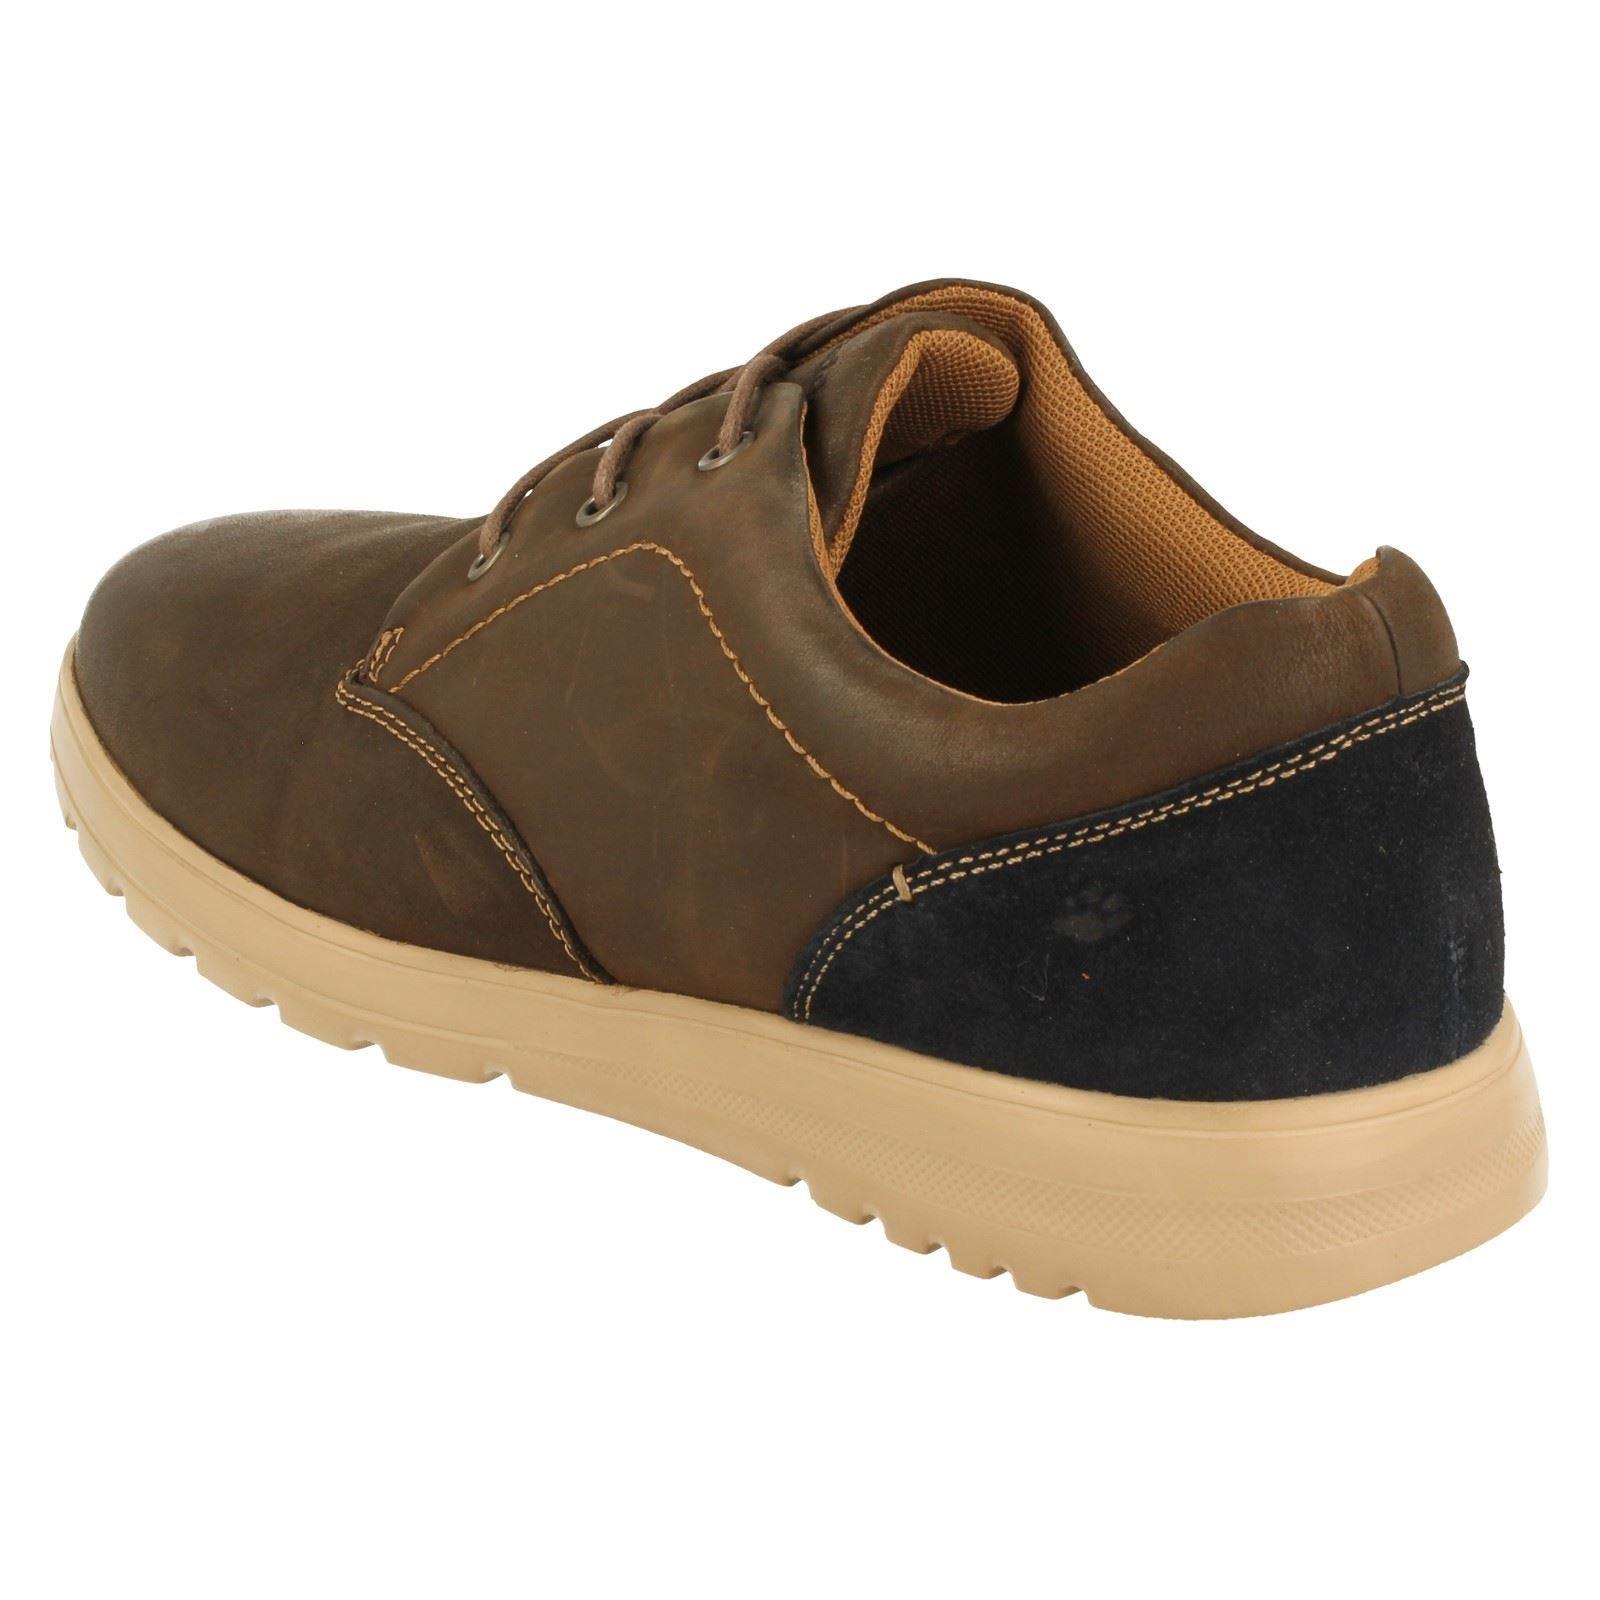 Mens Padder G/H Regain-W Dual Fit Shoes Style Regain-W G/H b34c73